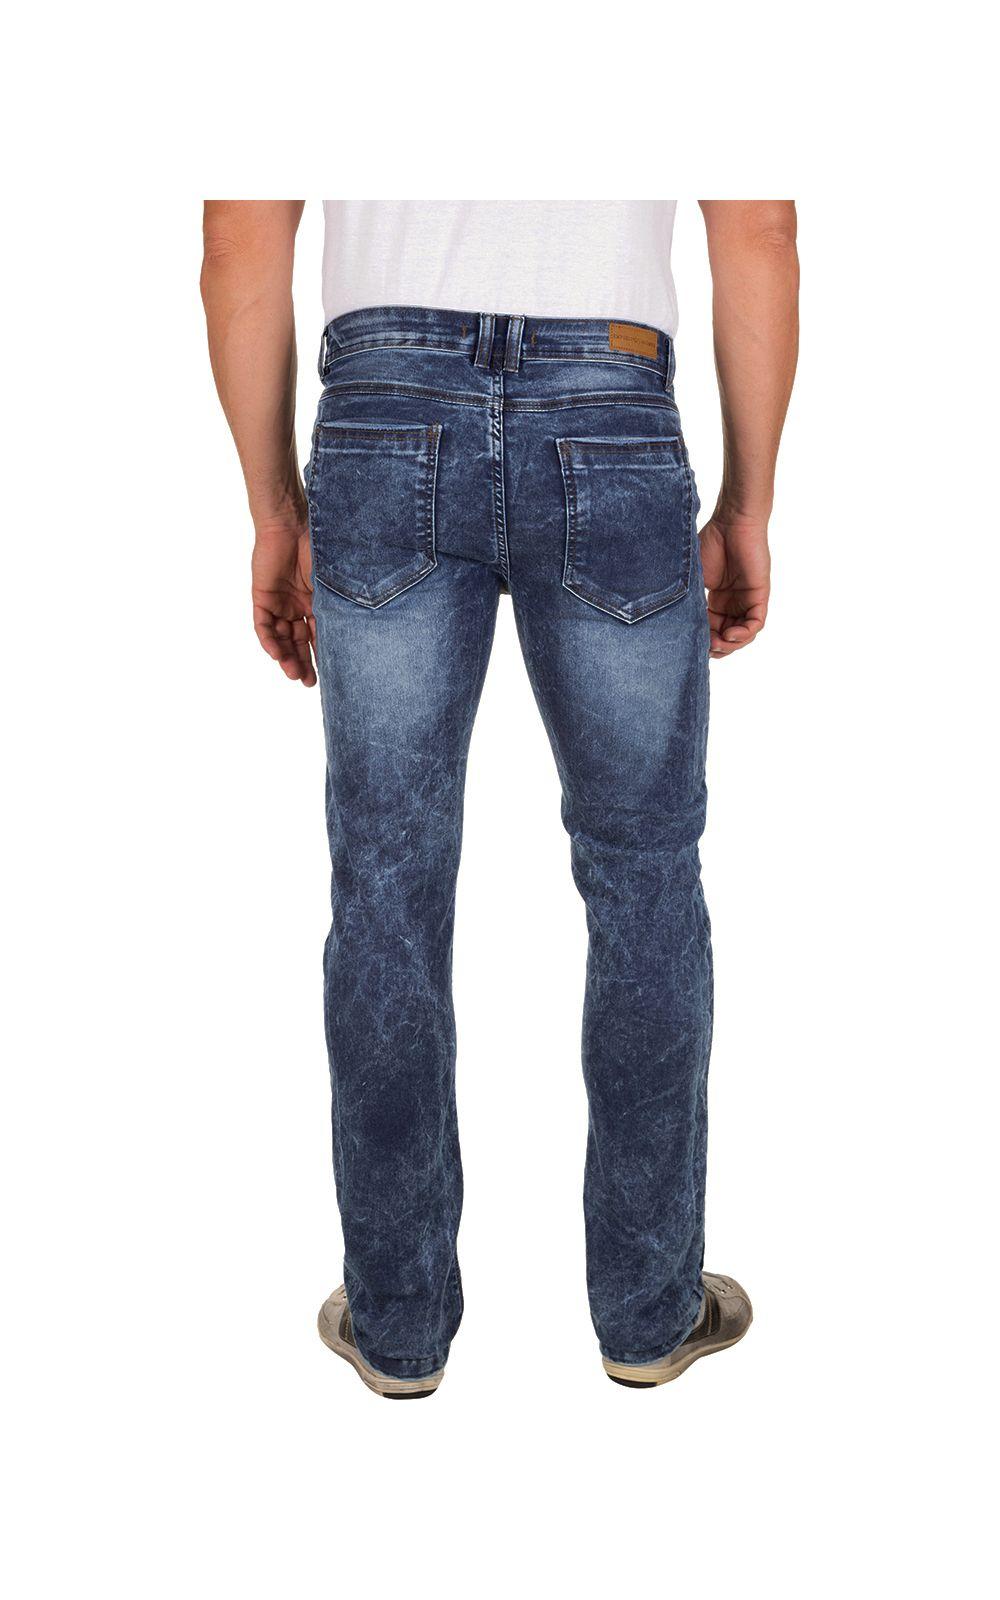 Foto 2 - Calça Jeans Masculina Azul Escuro Texturizada